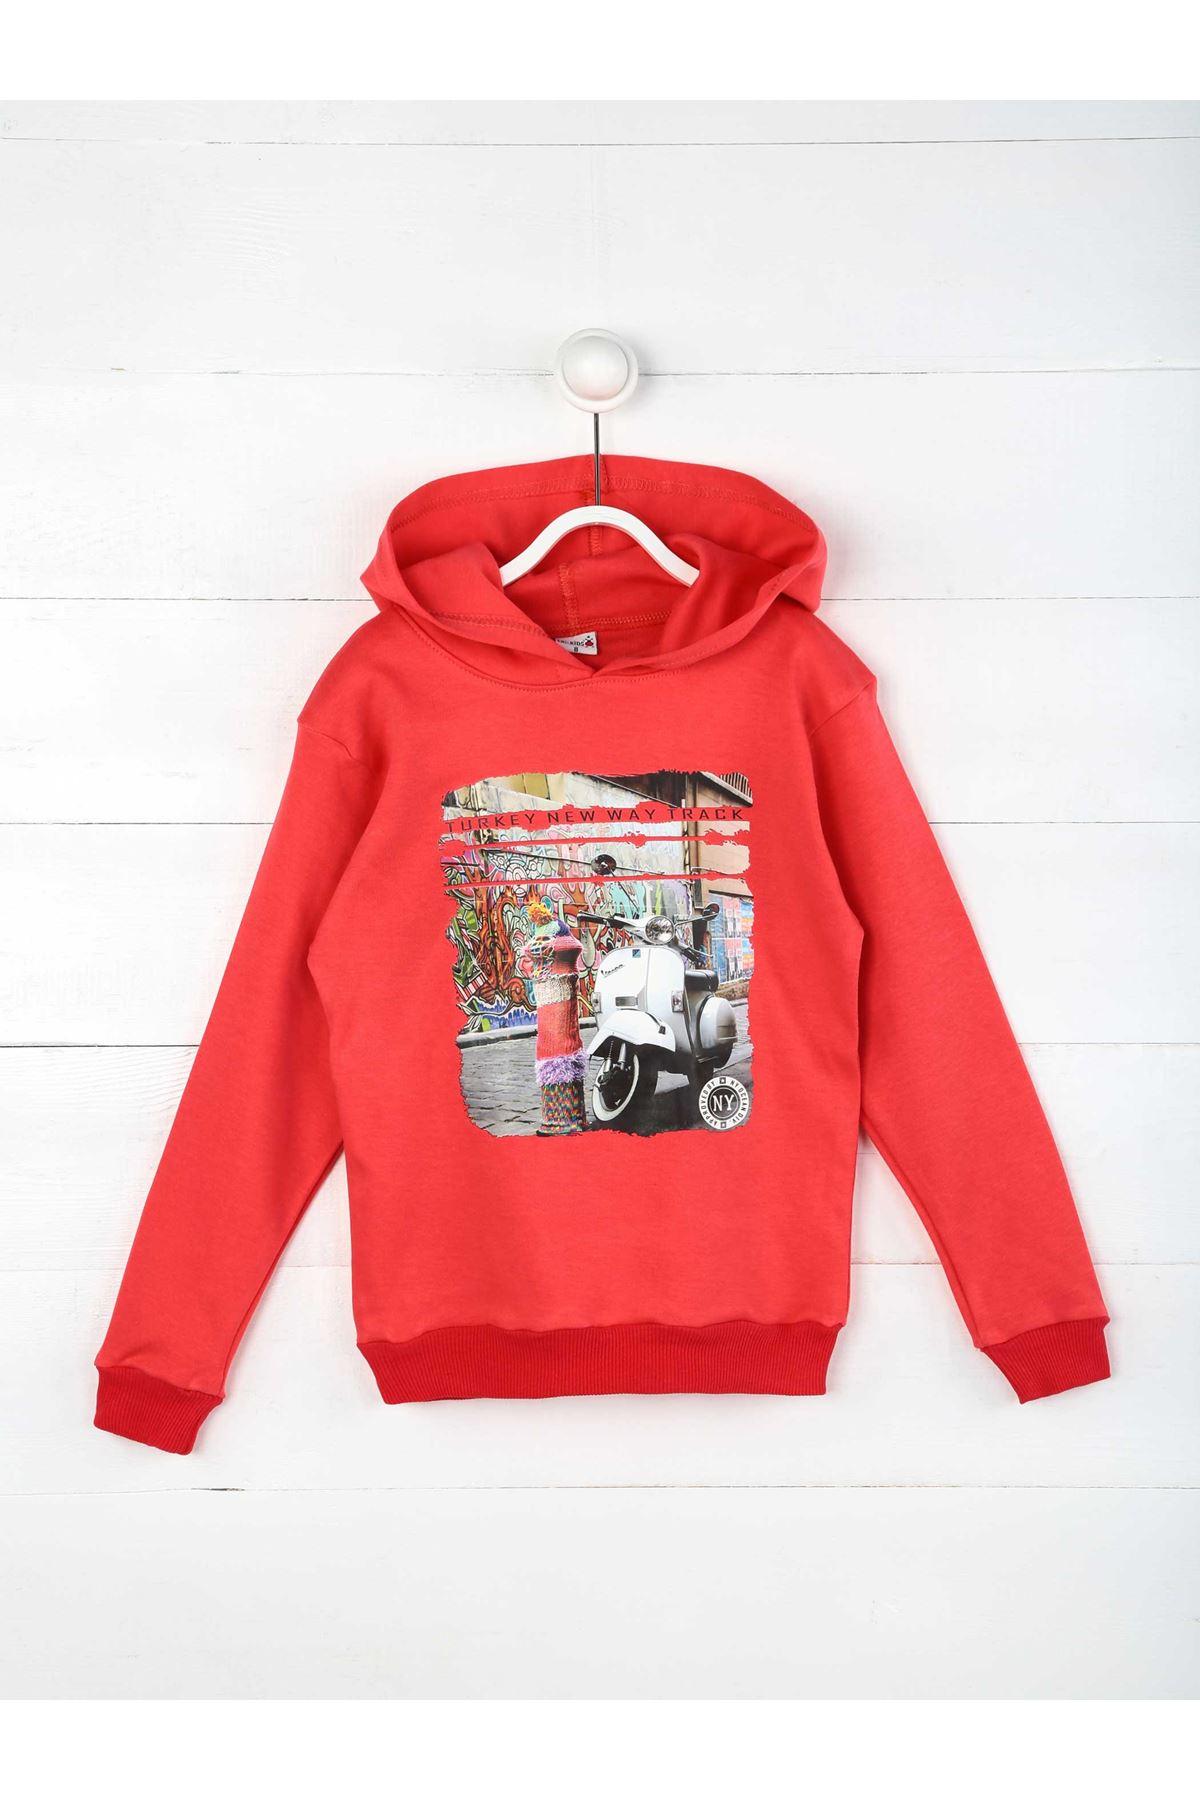 Pomegranate Flower Seasonal Hooded Girl's Sweatshirt